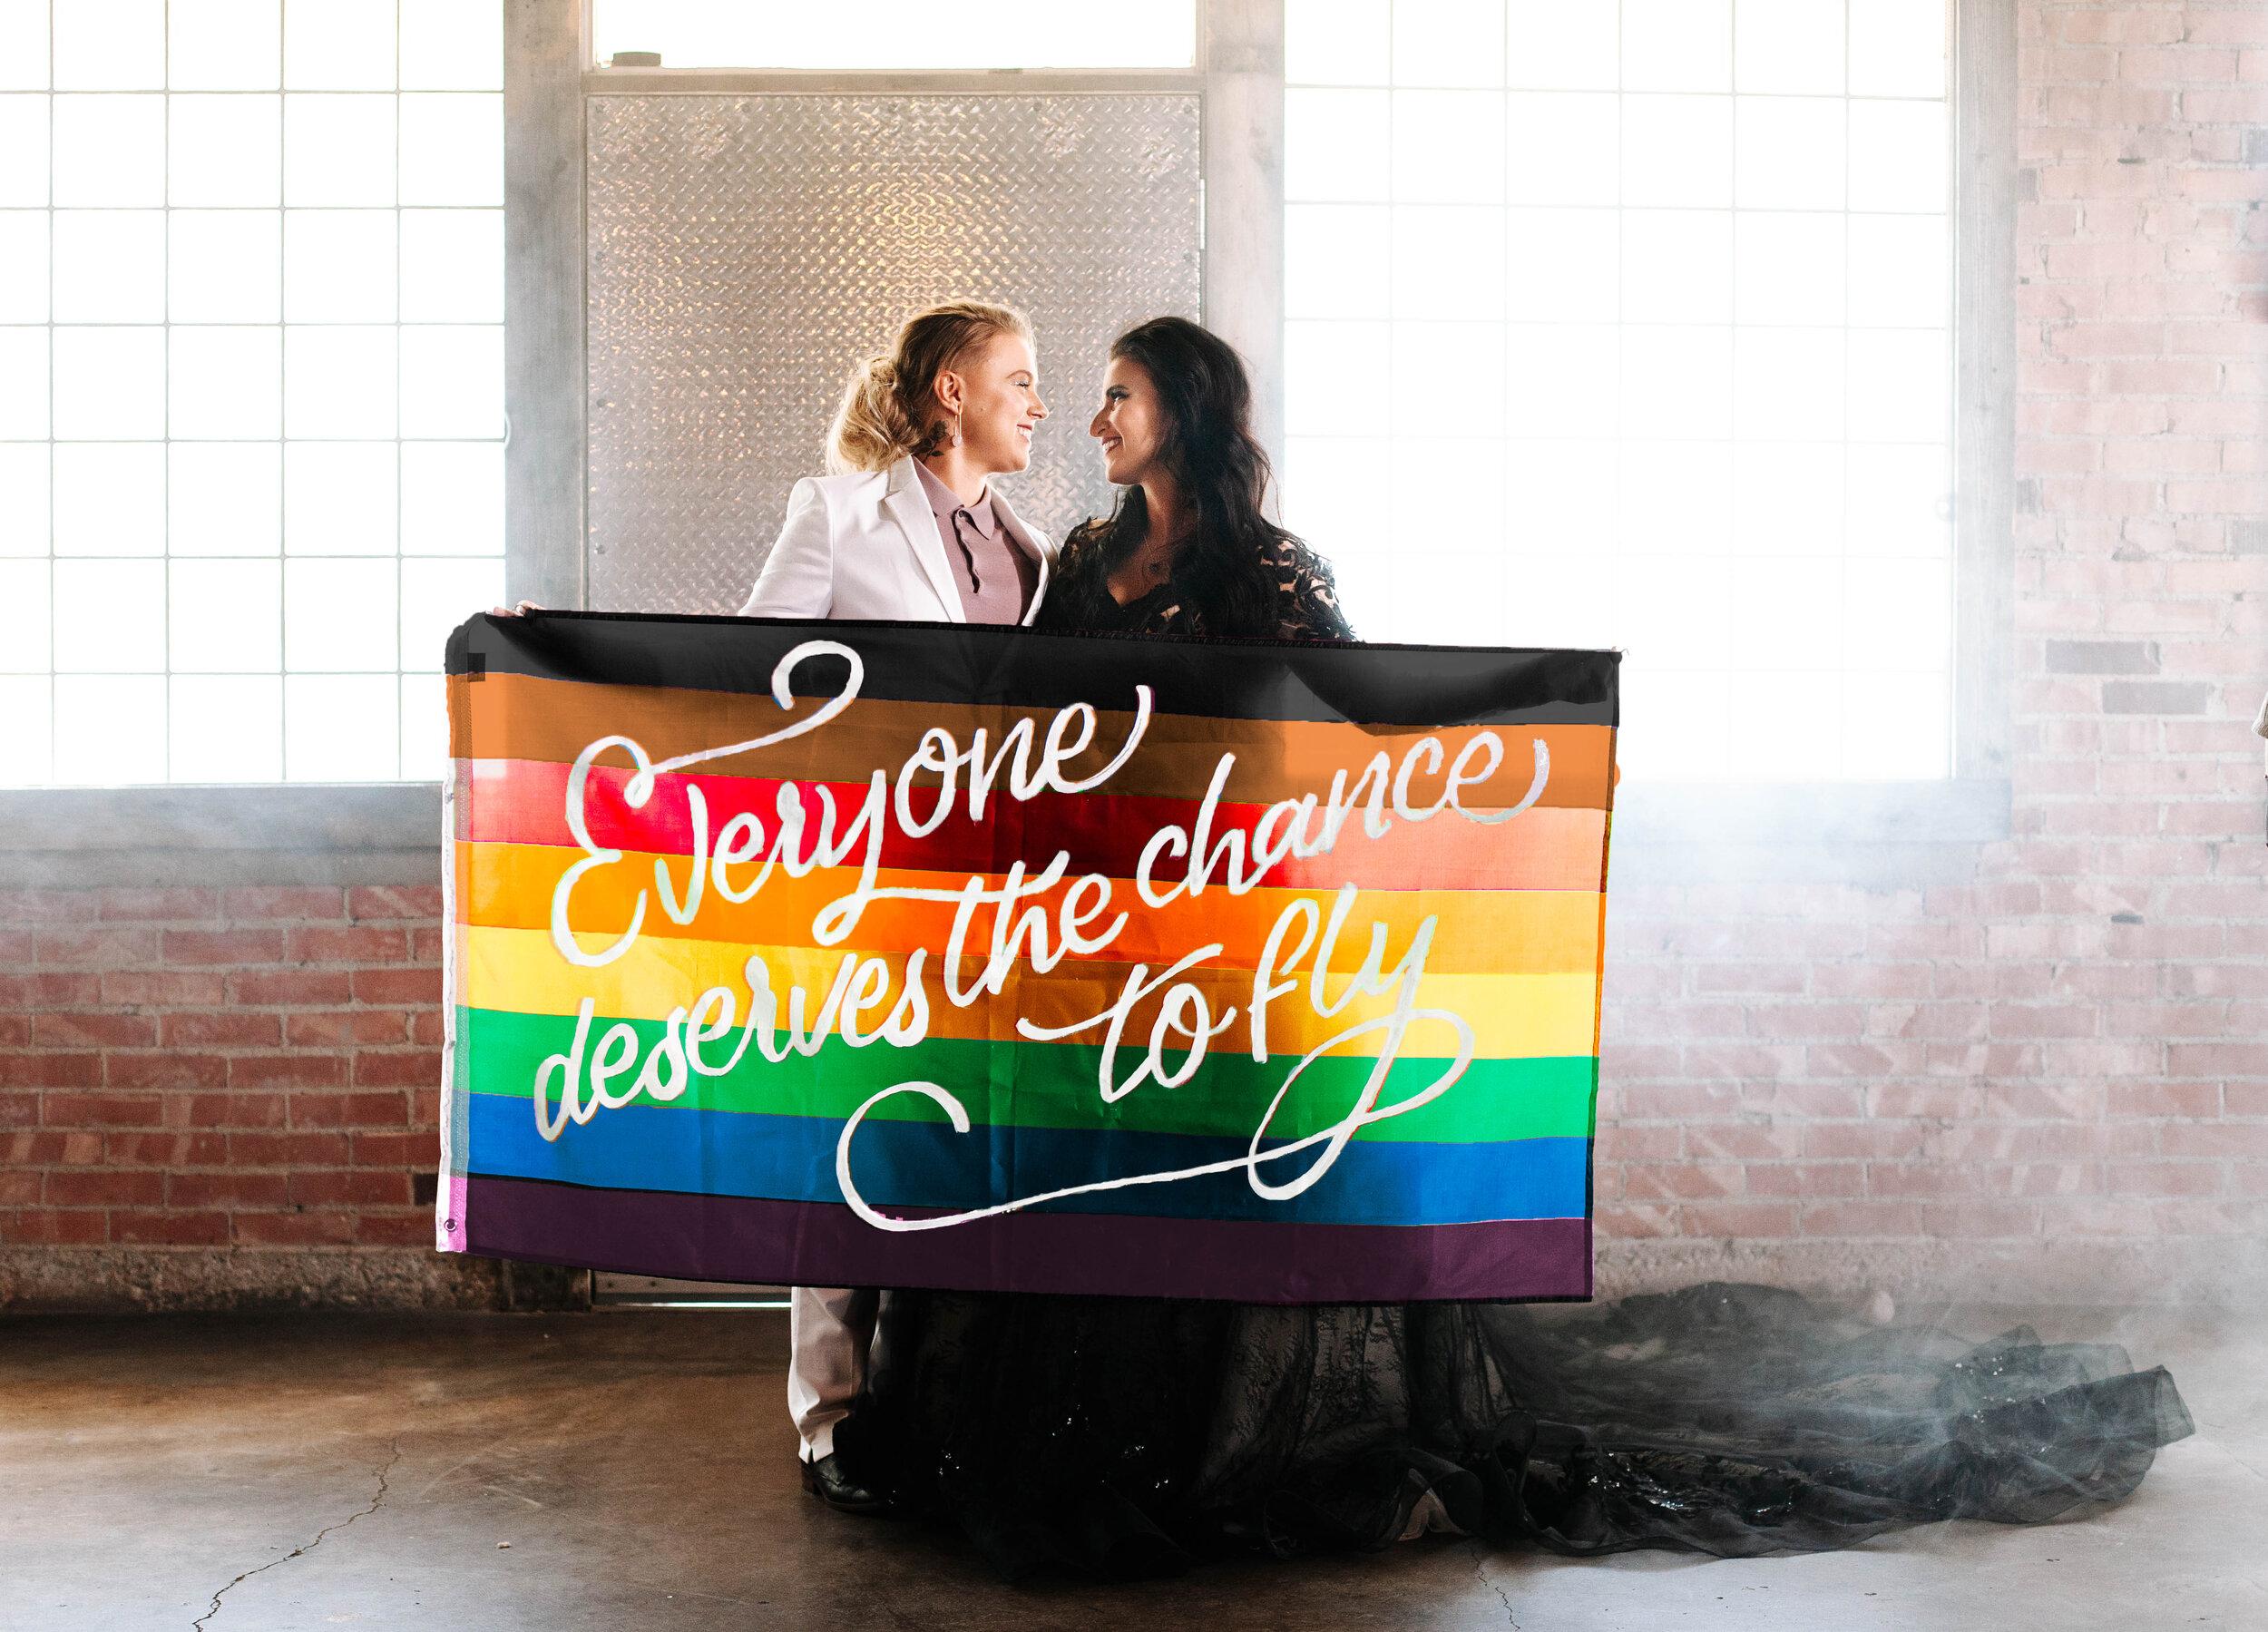 +Publik Coffee Co +Utah Wedding Venue +Salt Lake City Wedding +LGBTQ Utah Wedding +Utah Wedding Photographer +Marina Rey Photo-8546.jpg